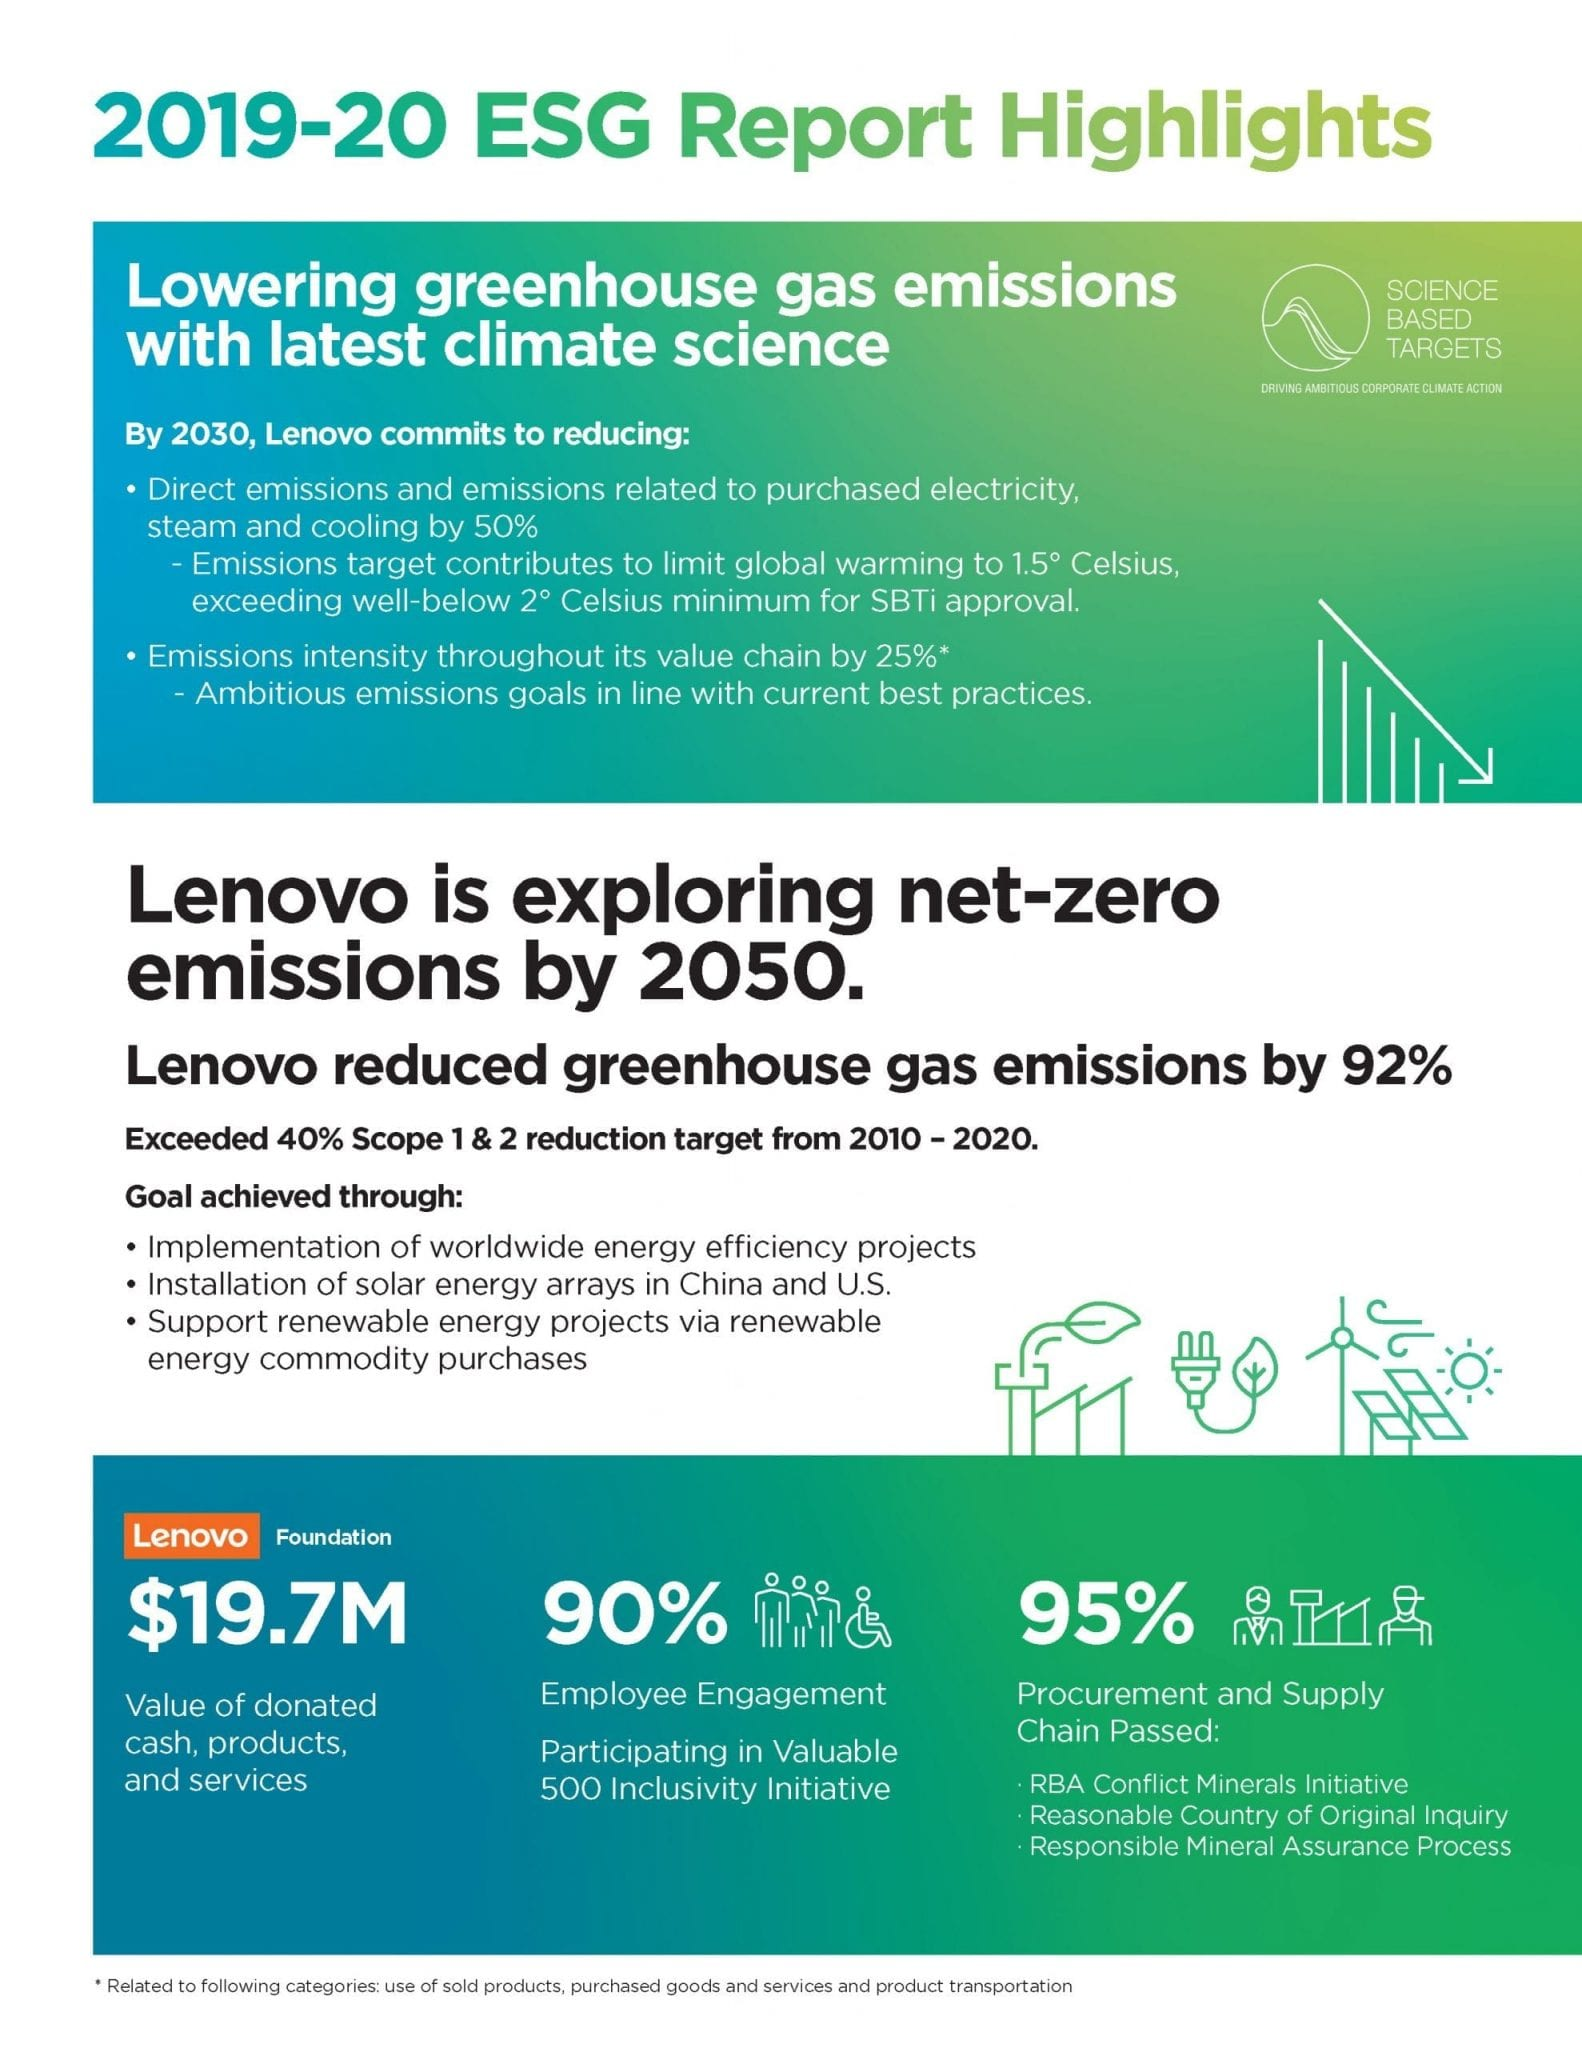 Lenovo's 2019/20 ESG Report Infographic